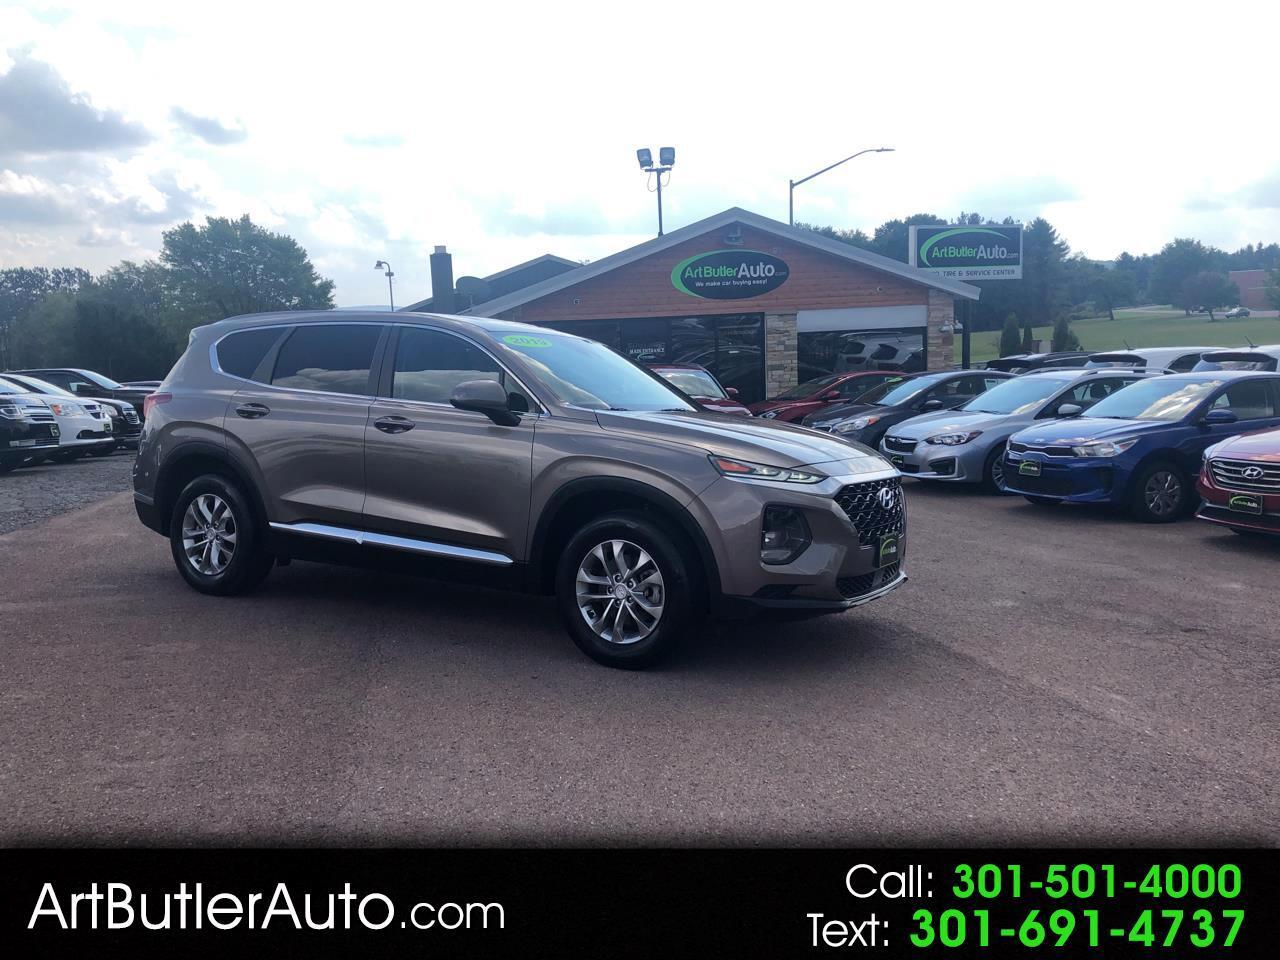 2019 Hyundai Santa Fe SE 2.4L Auto AWD